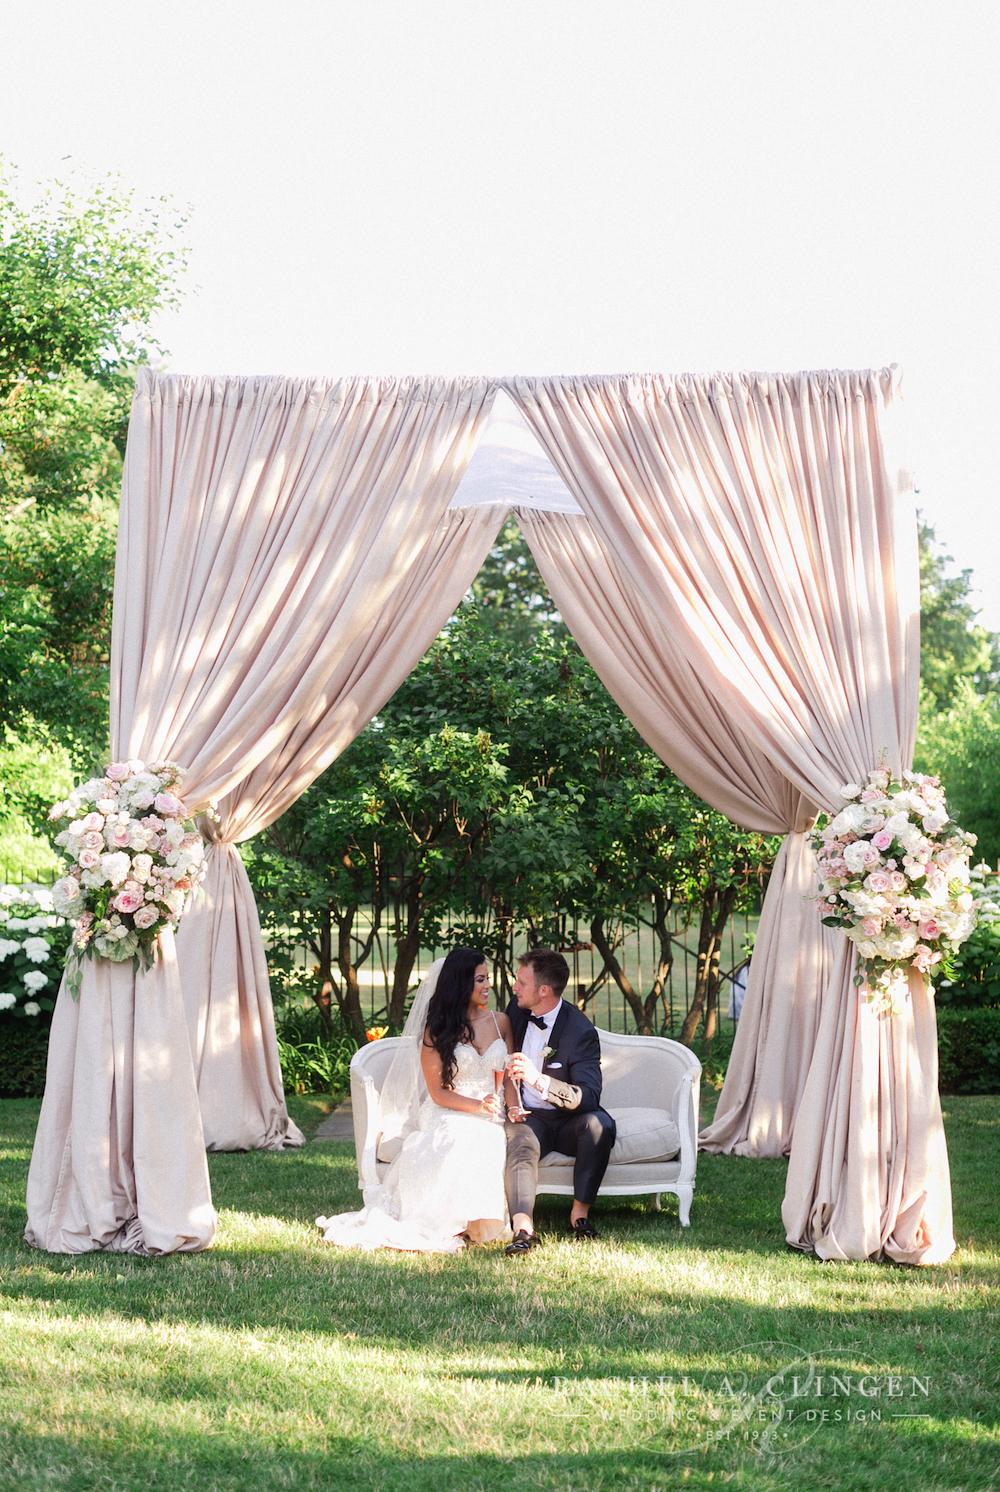 Graydon Hall Weddings Archives Wedding Decor Toronto Rachel A Clingen Wedding Amp Event Design